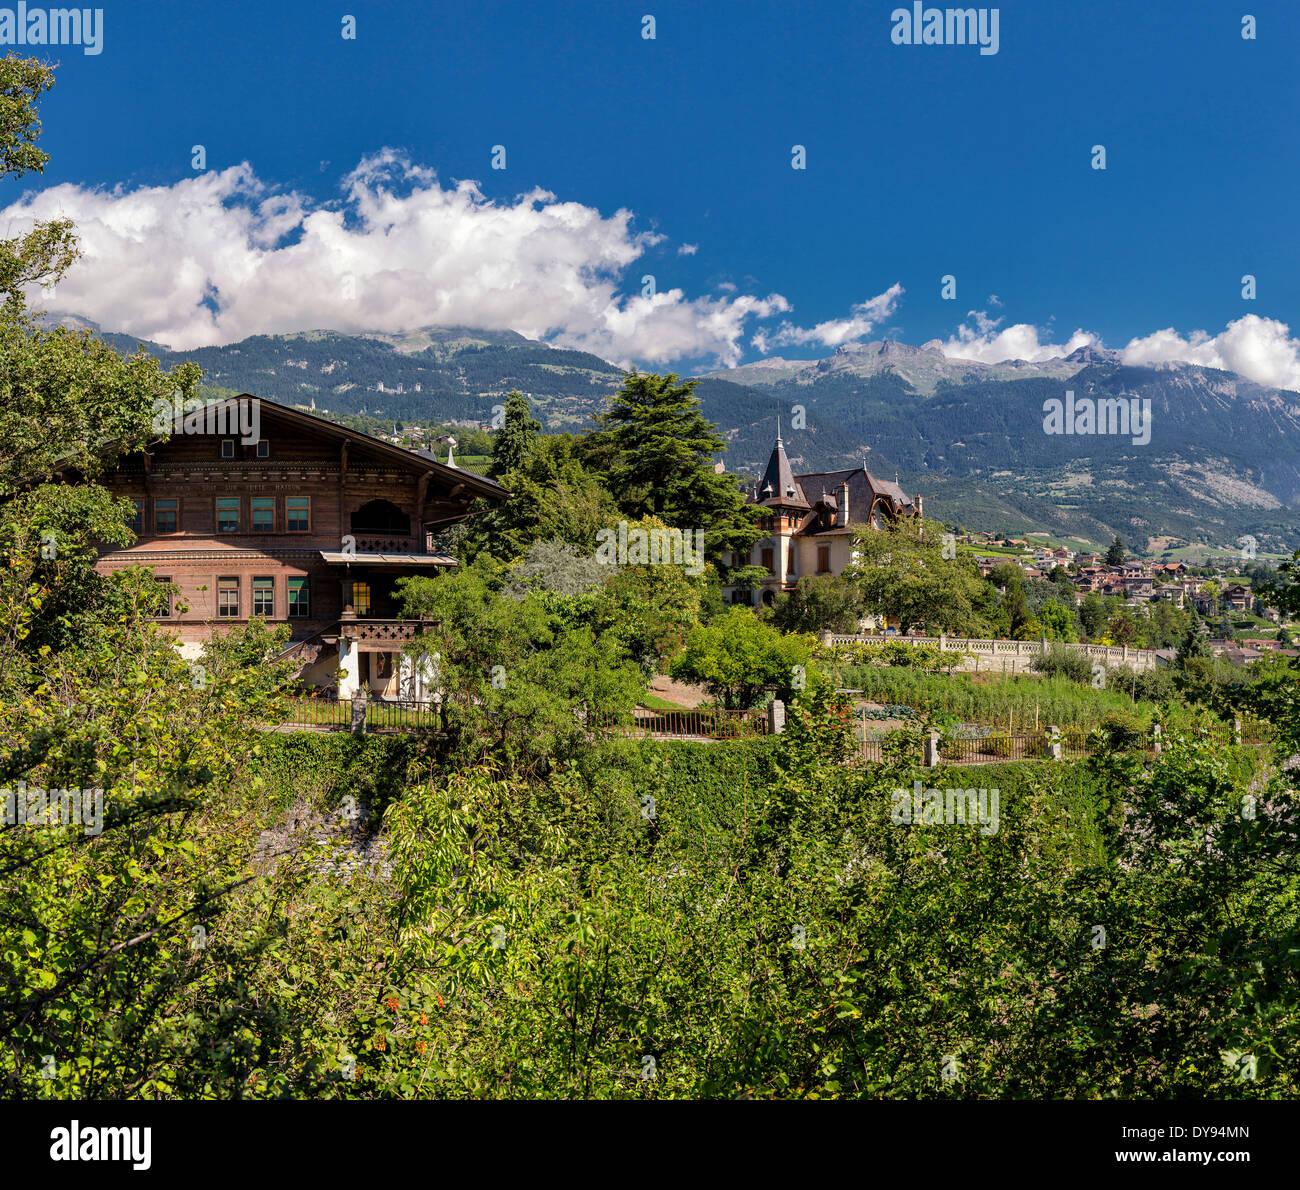 Haus Berge: Sierre Valais Switzerland Stockfotos & Sierre Valais